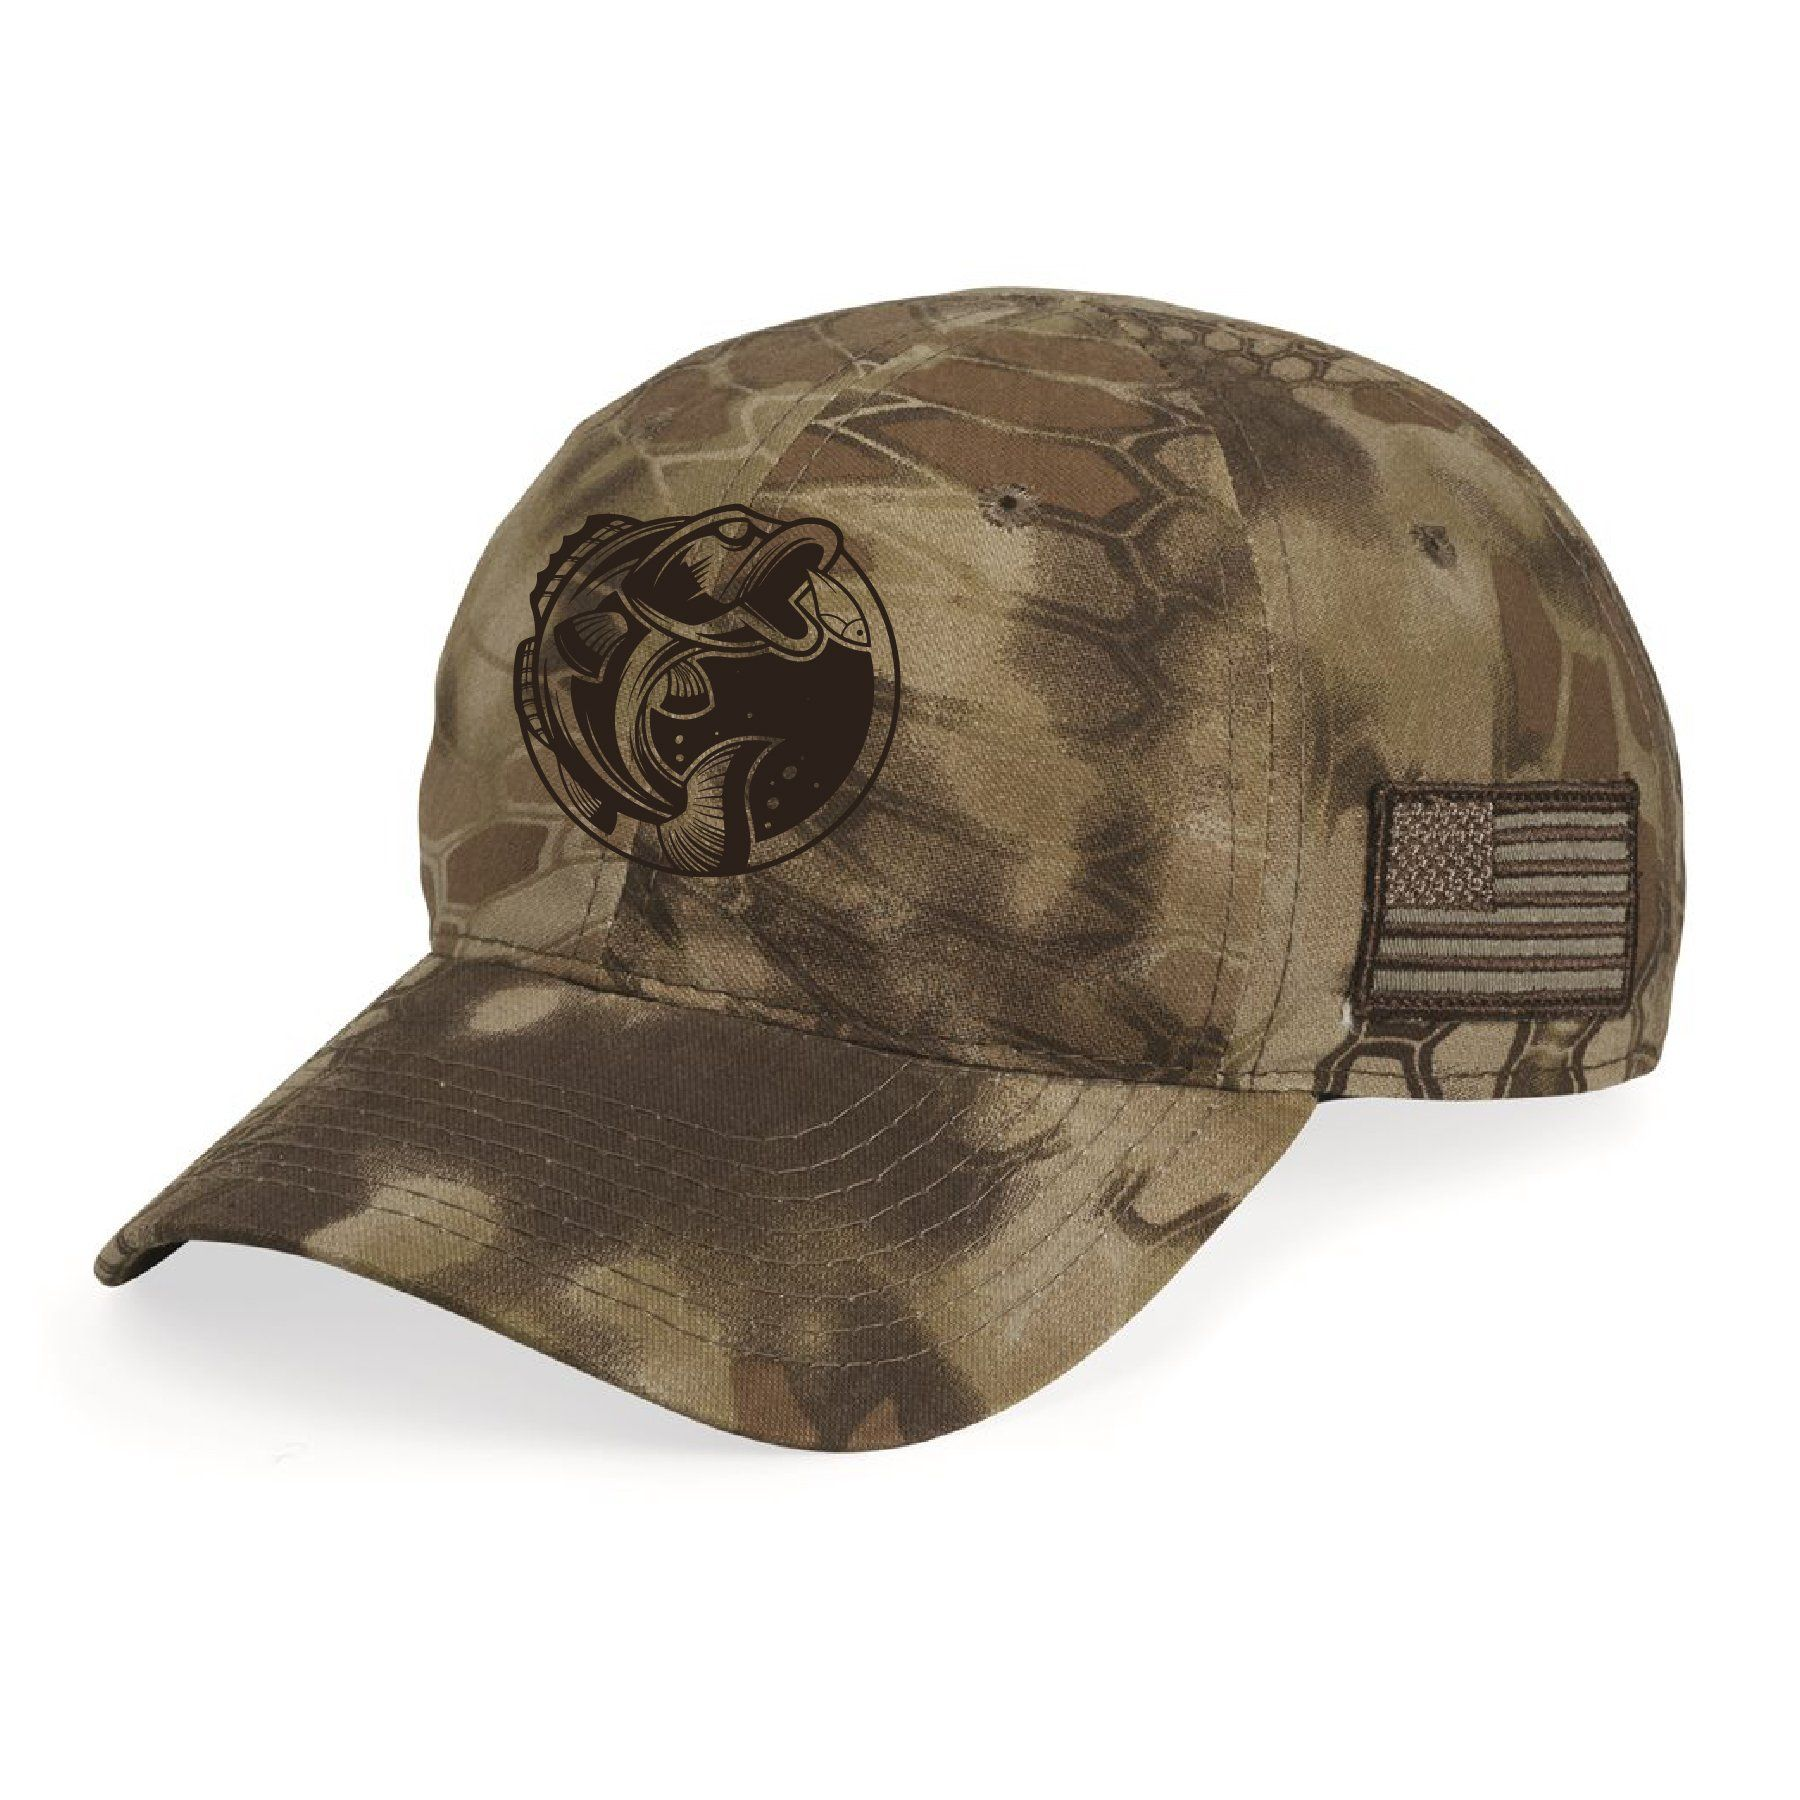 eb4a41cce LunkersTV Camo Hat | christmas list | Camo hats, Hats, Baseball hats